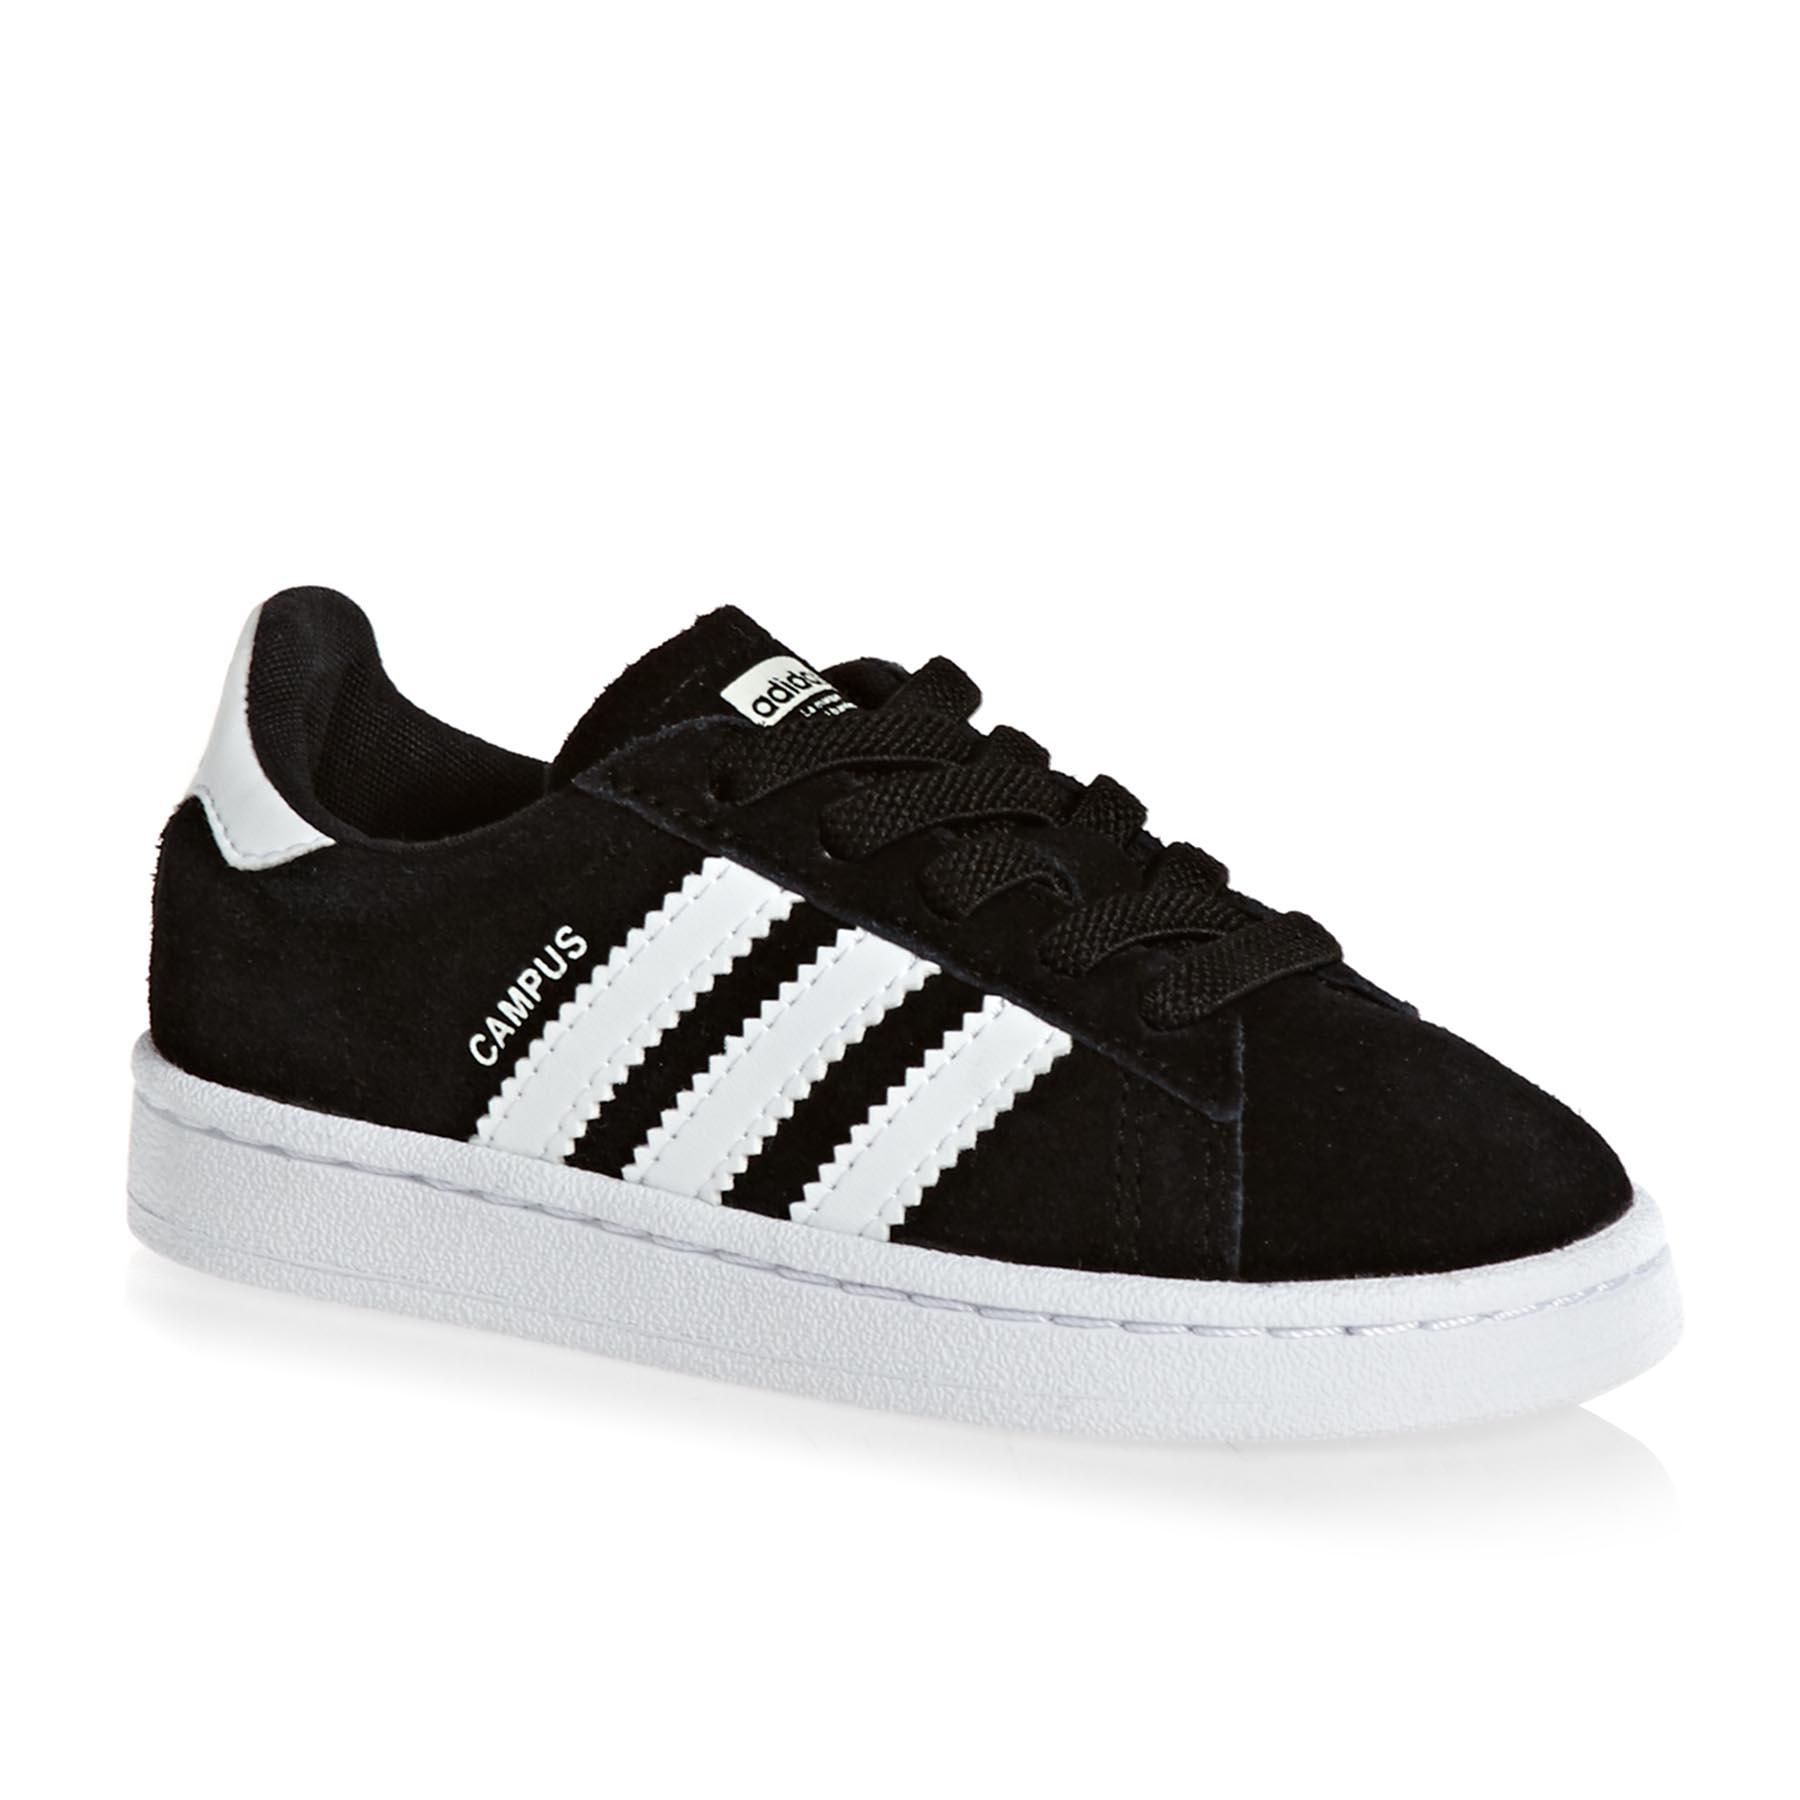 Adidas Originals Campus Junior Kinder Schuhe Free Delivery